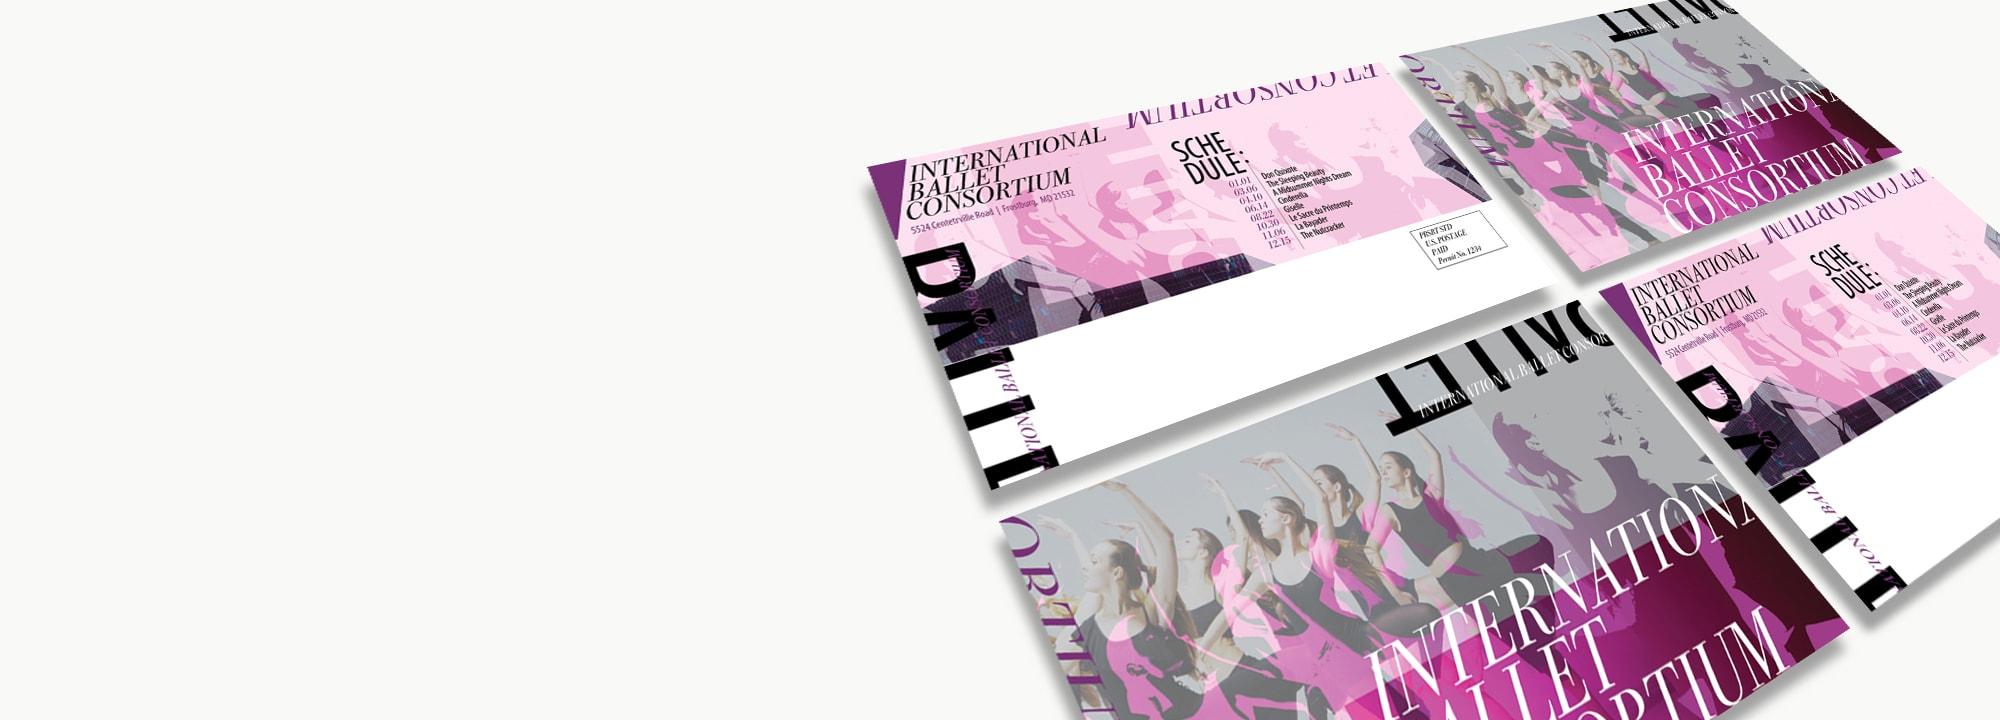 Custom X Postcard Printing Print Business Cards Vinyl - 6x11 postcard template